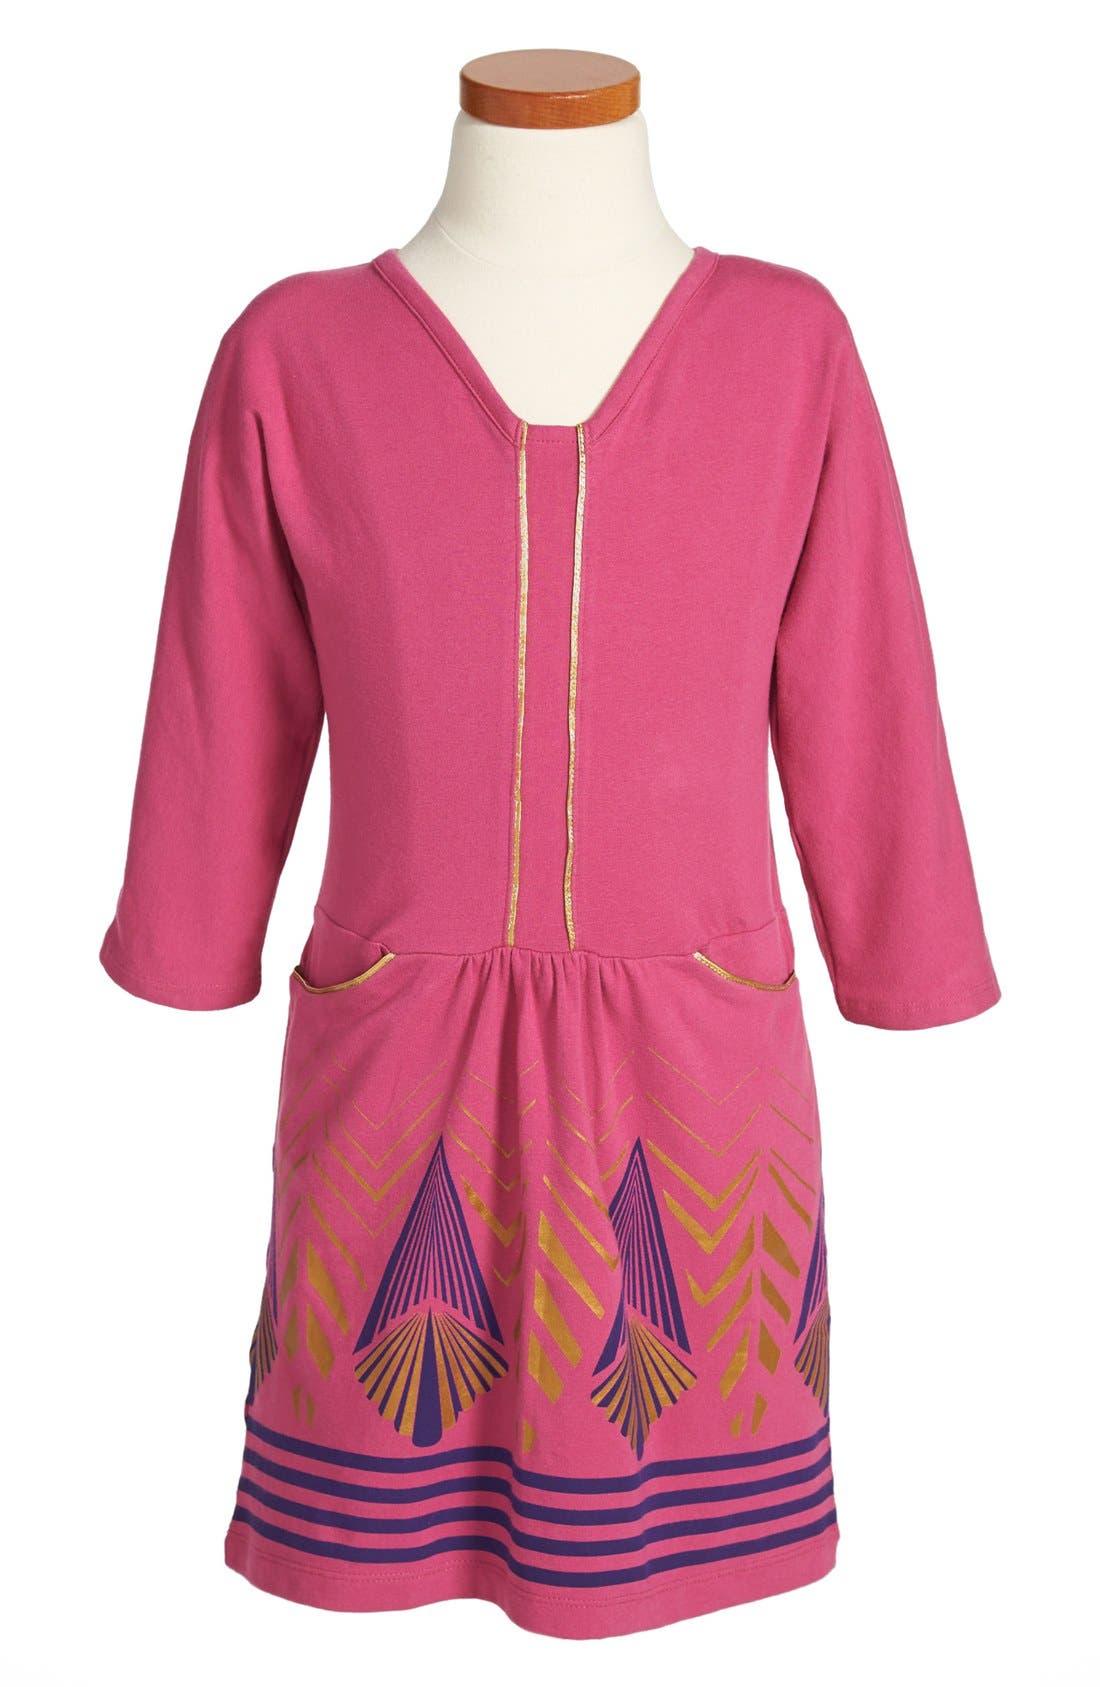 Main Image - Tea Collection 'Shanghai Deco' Dress (Little Girls & Big Girls)